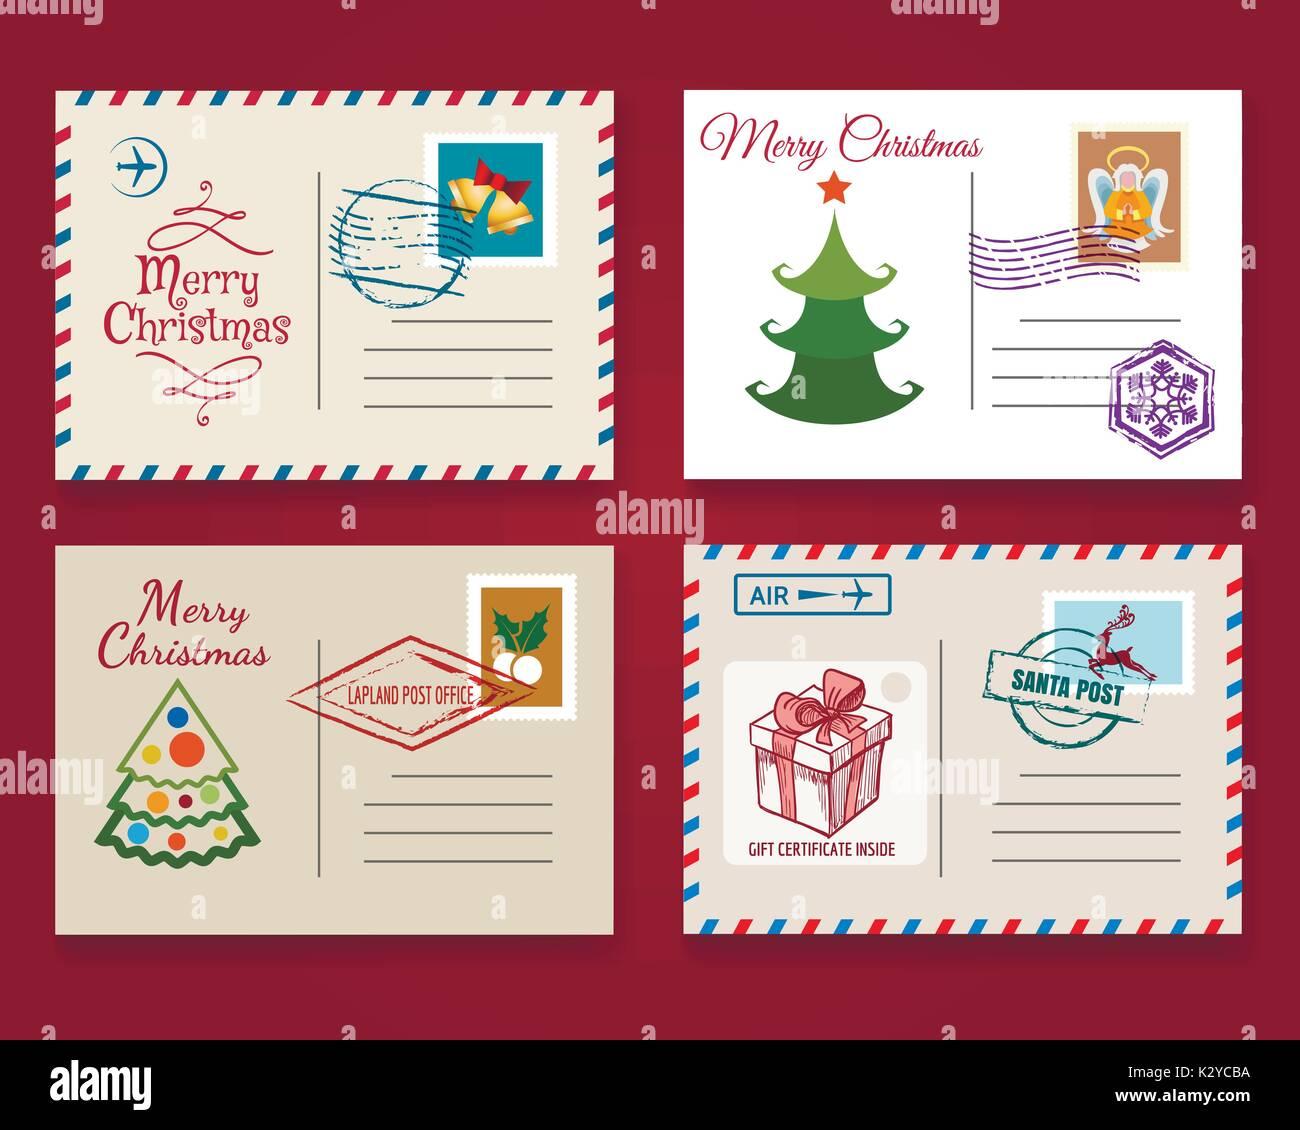 Xmas Postcard Template Set Vector Vintage Merry Christmas Holiday - Christmas postcard template